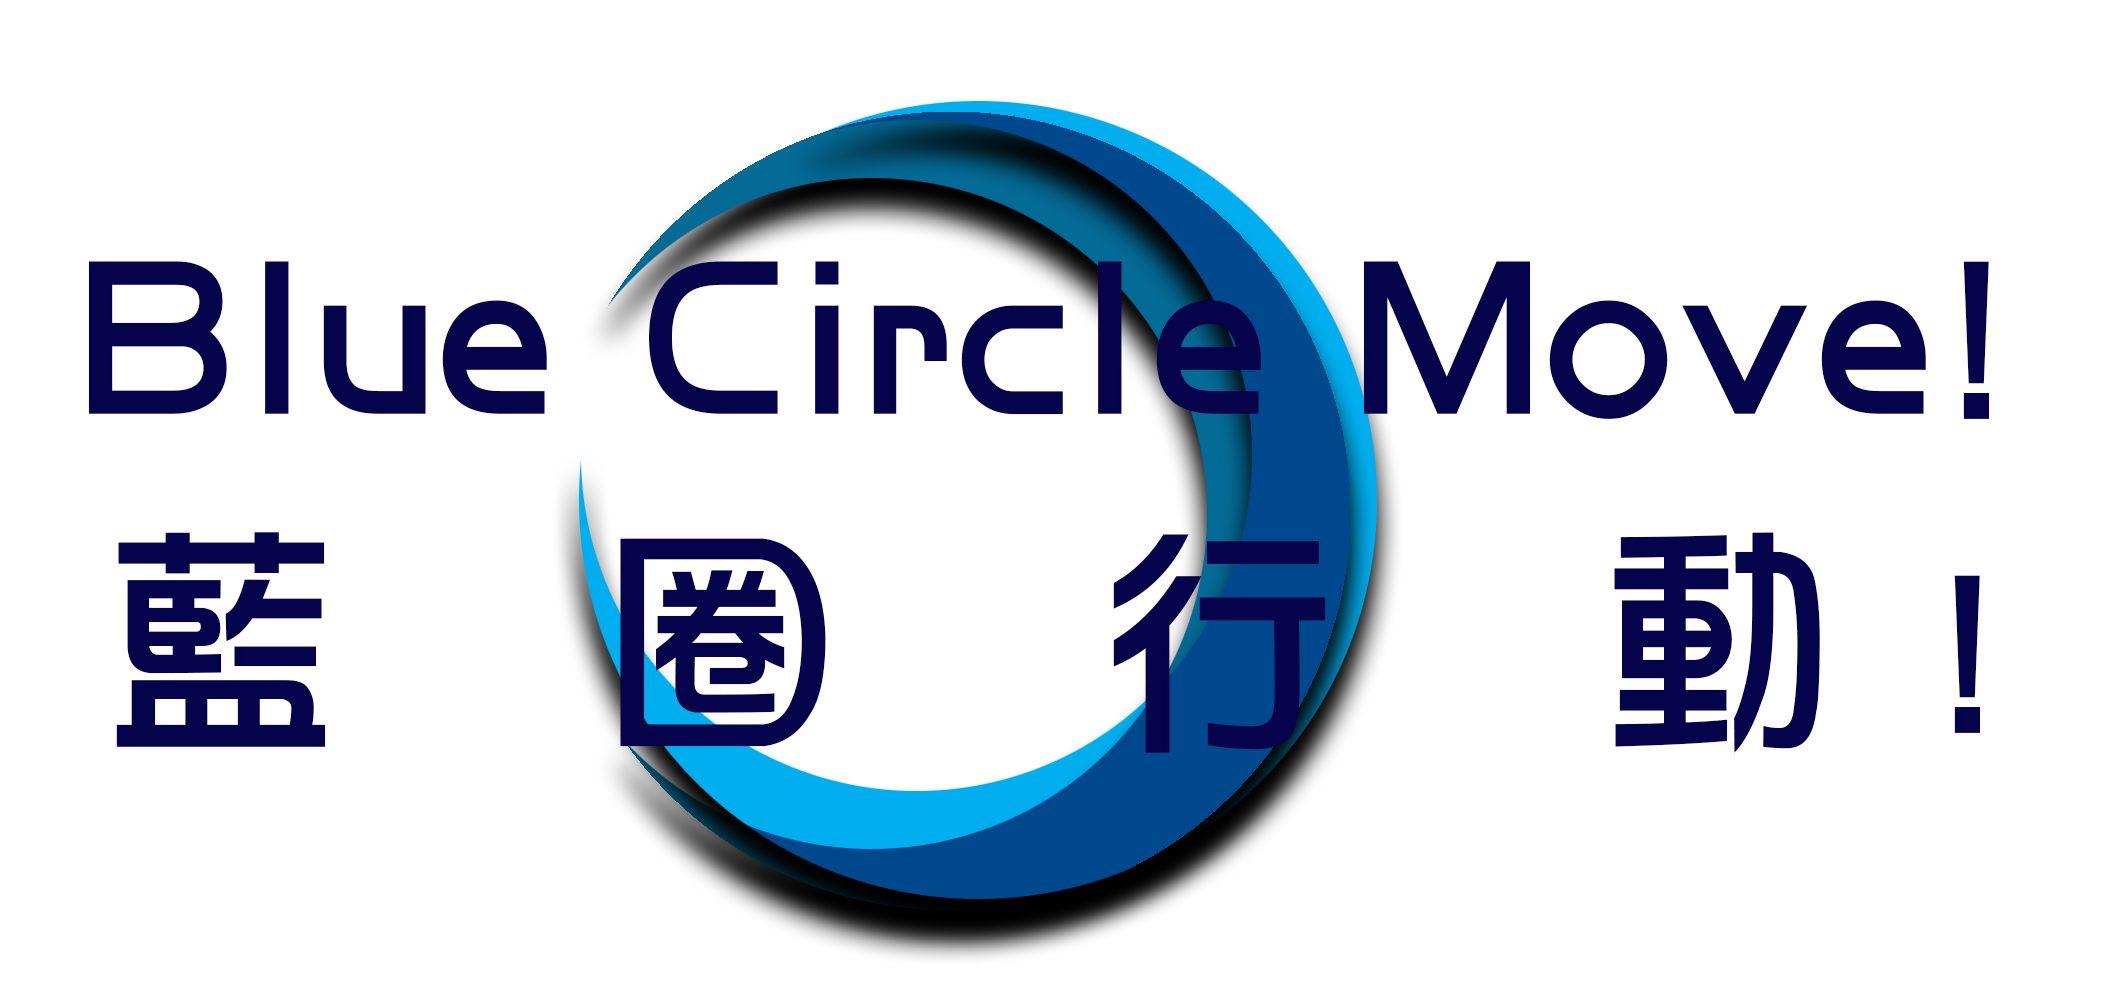 Blue Circle Move Company Limited 藍圈行動